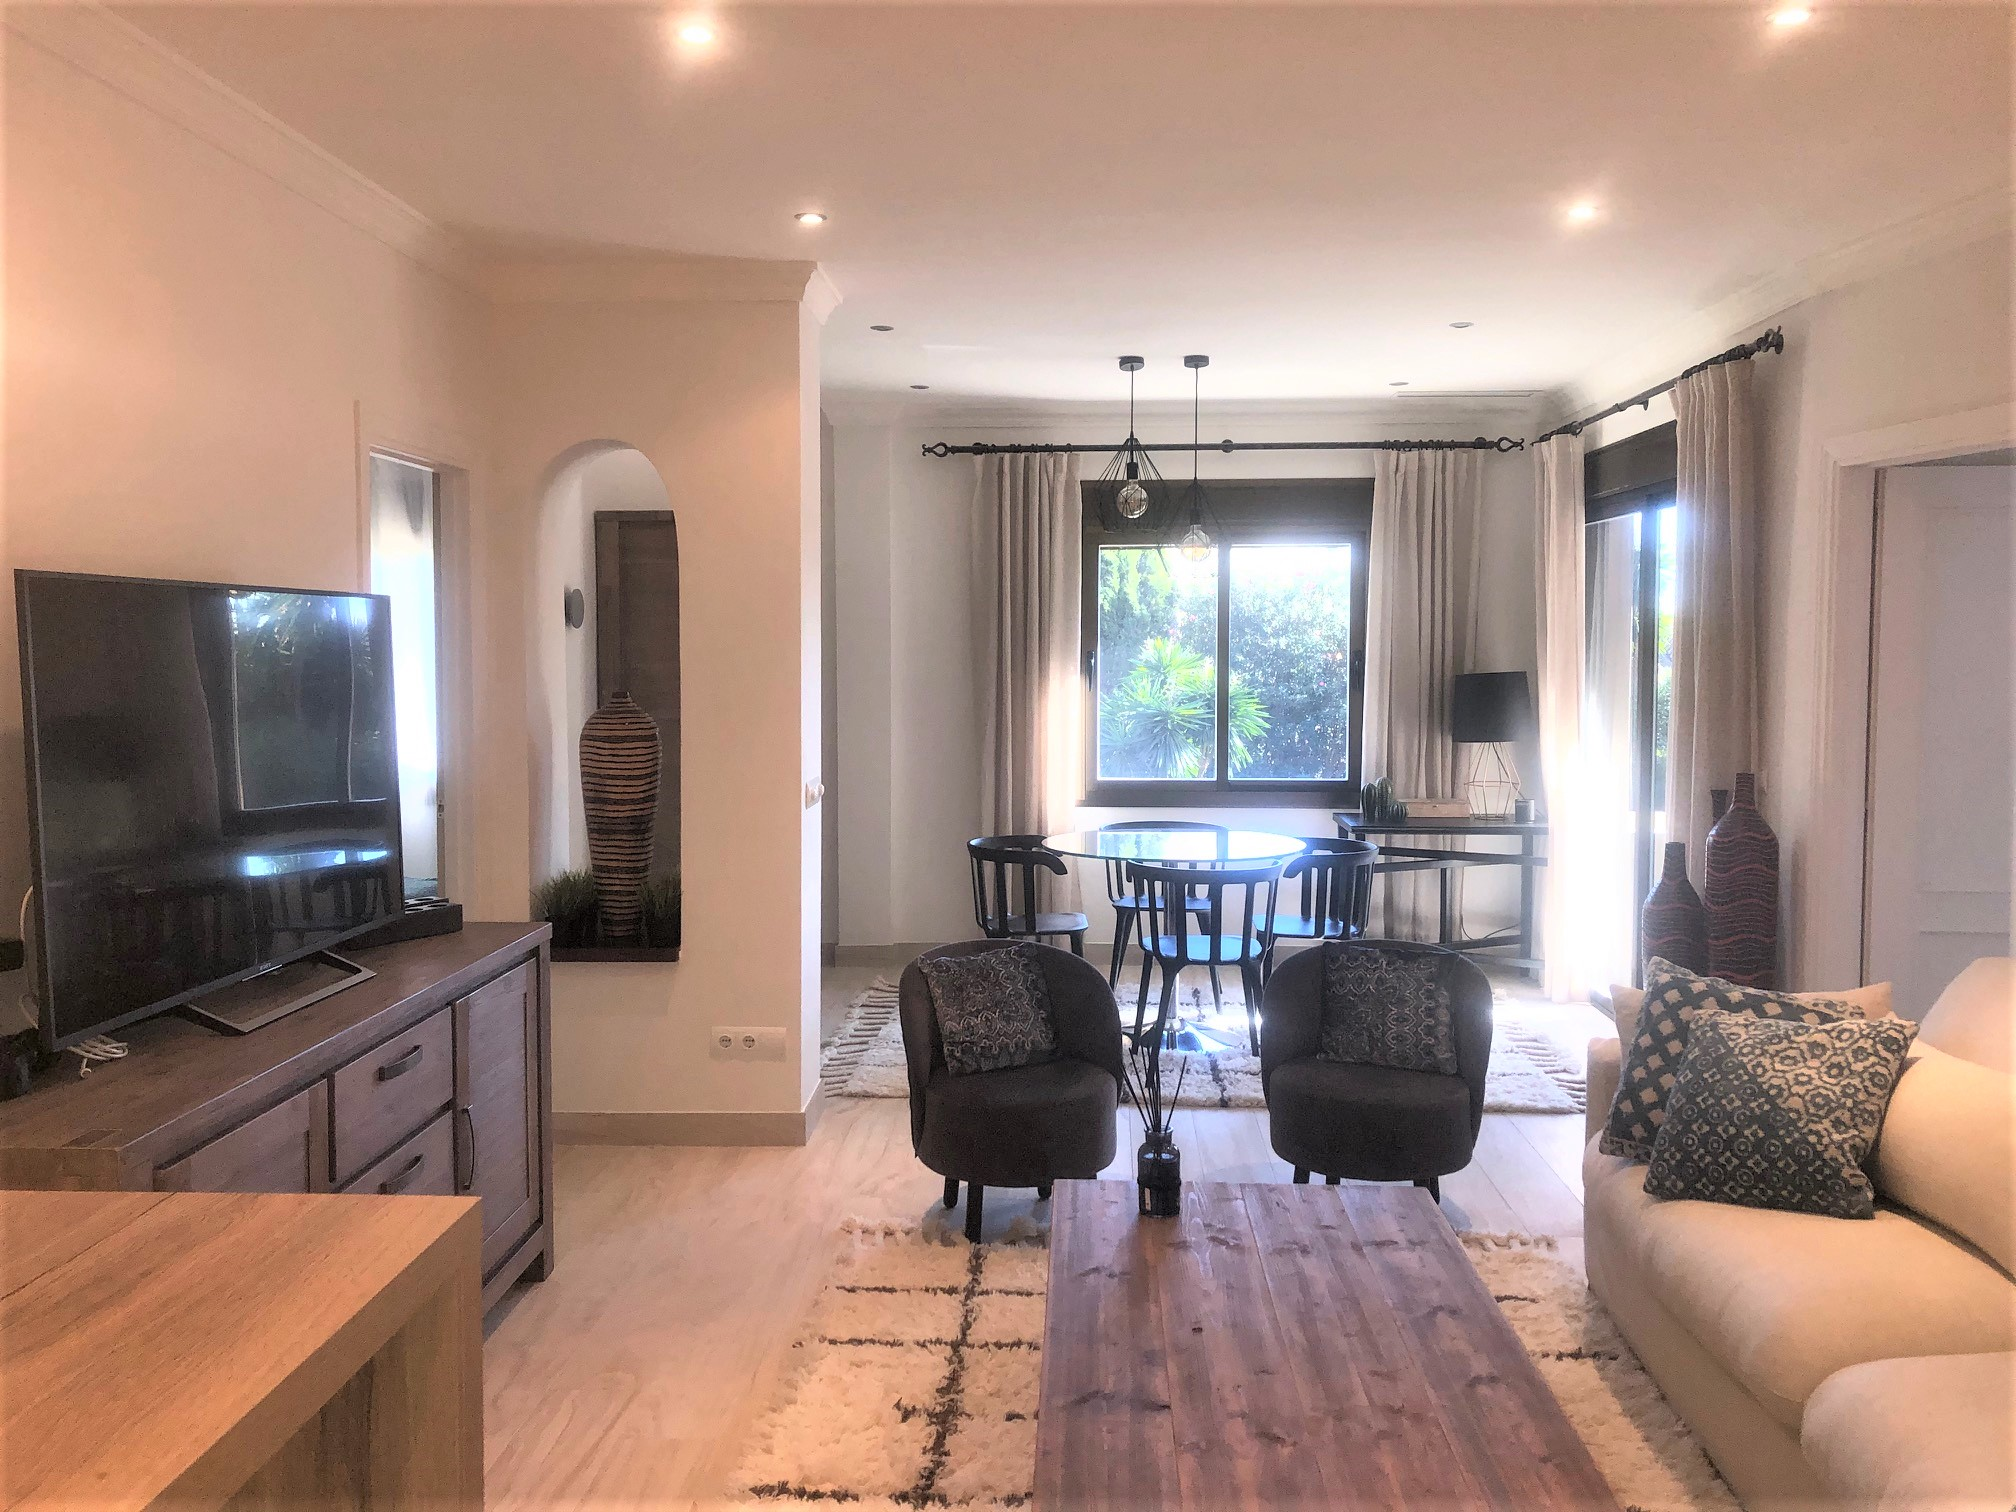 BEAUTIFUL TWO BEDROOM APARTMENT FOR RENT AT HOTEL DEL GOLF. LAS BRISAS